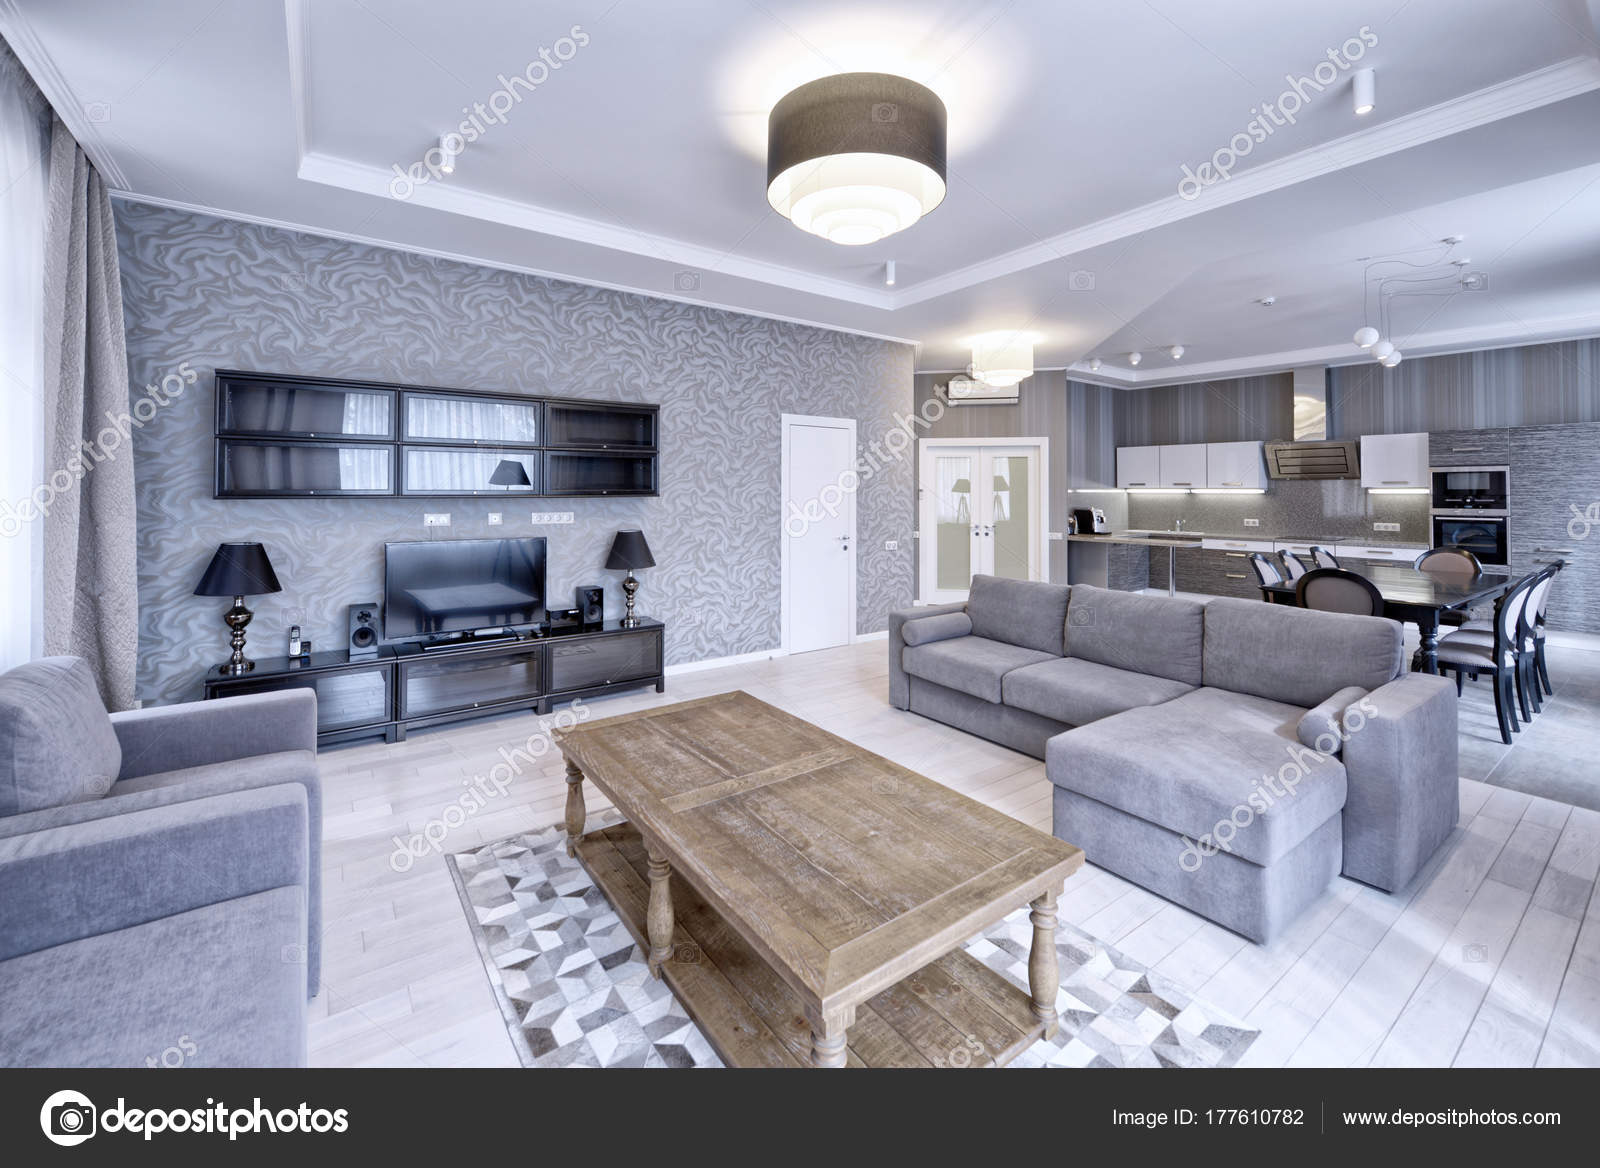 https://st3.depositphotos.com/4730441/17761/i/1600/depositphotos_177610782-stockafbeelding-moderne-design-interieur-van-woonkamer.jpg